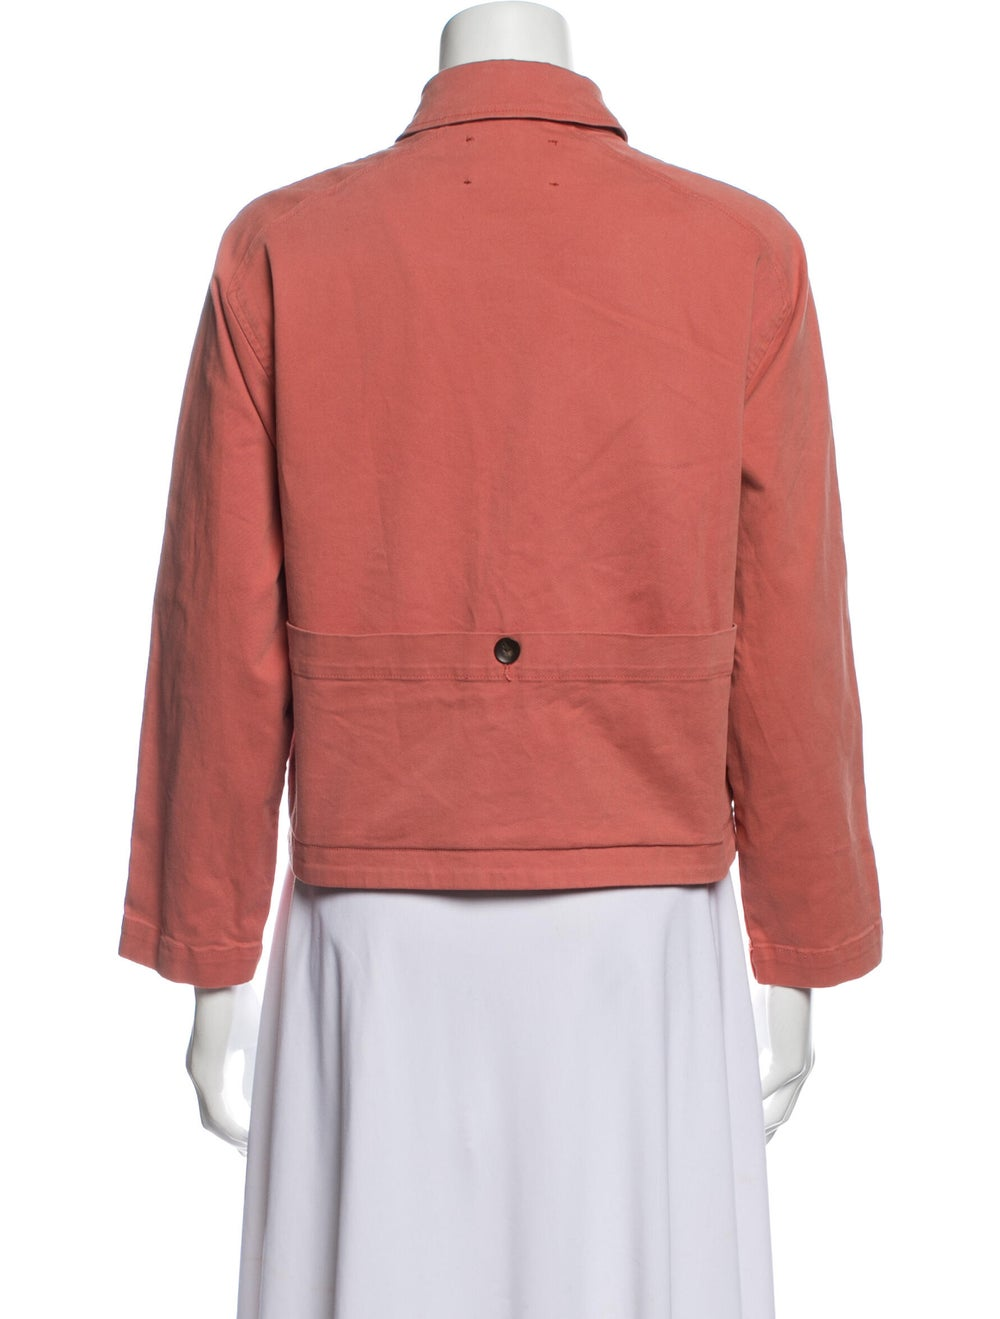 Paloma Wool Jacket Wool - image 3